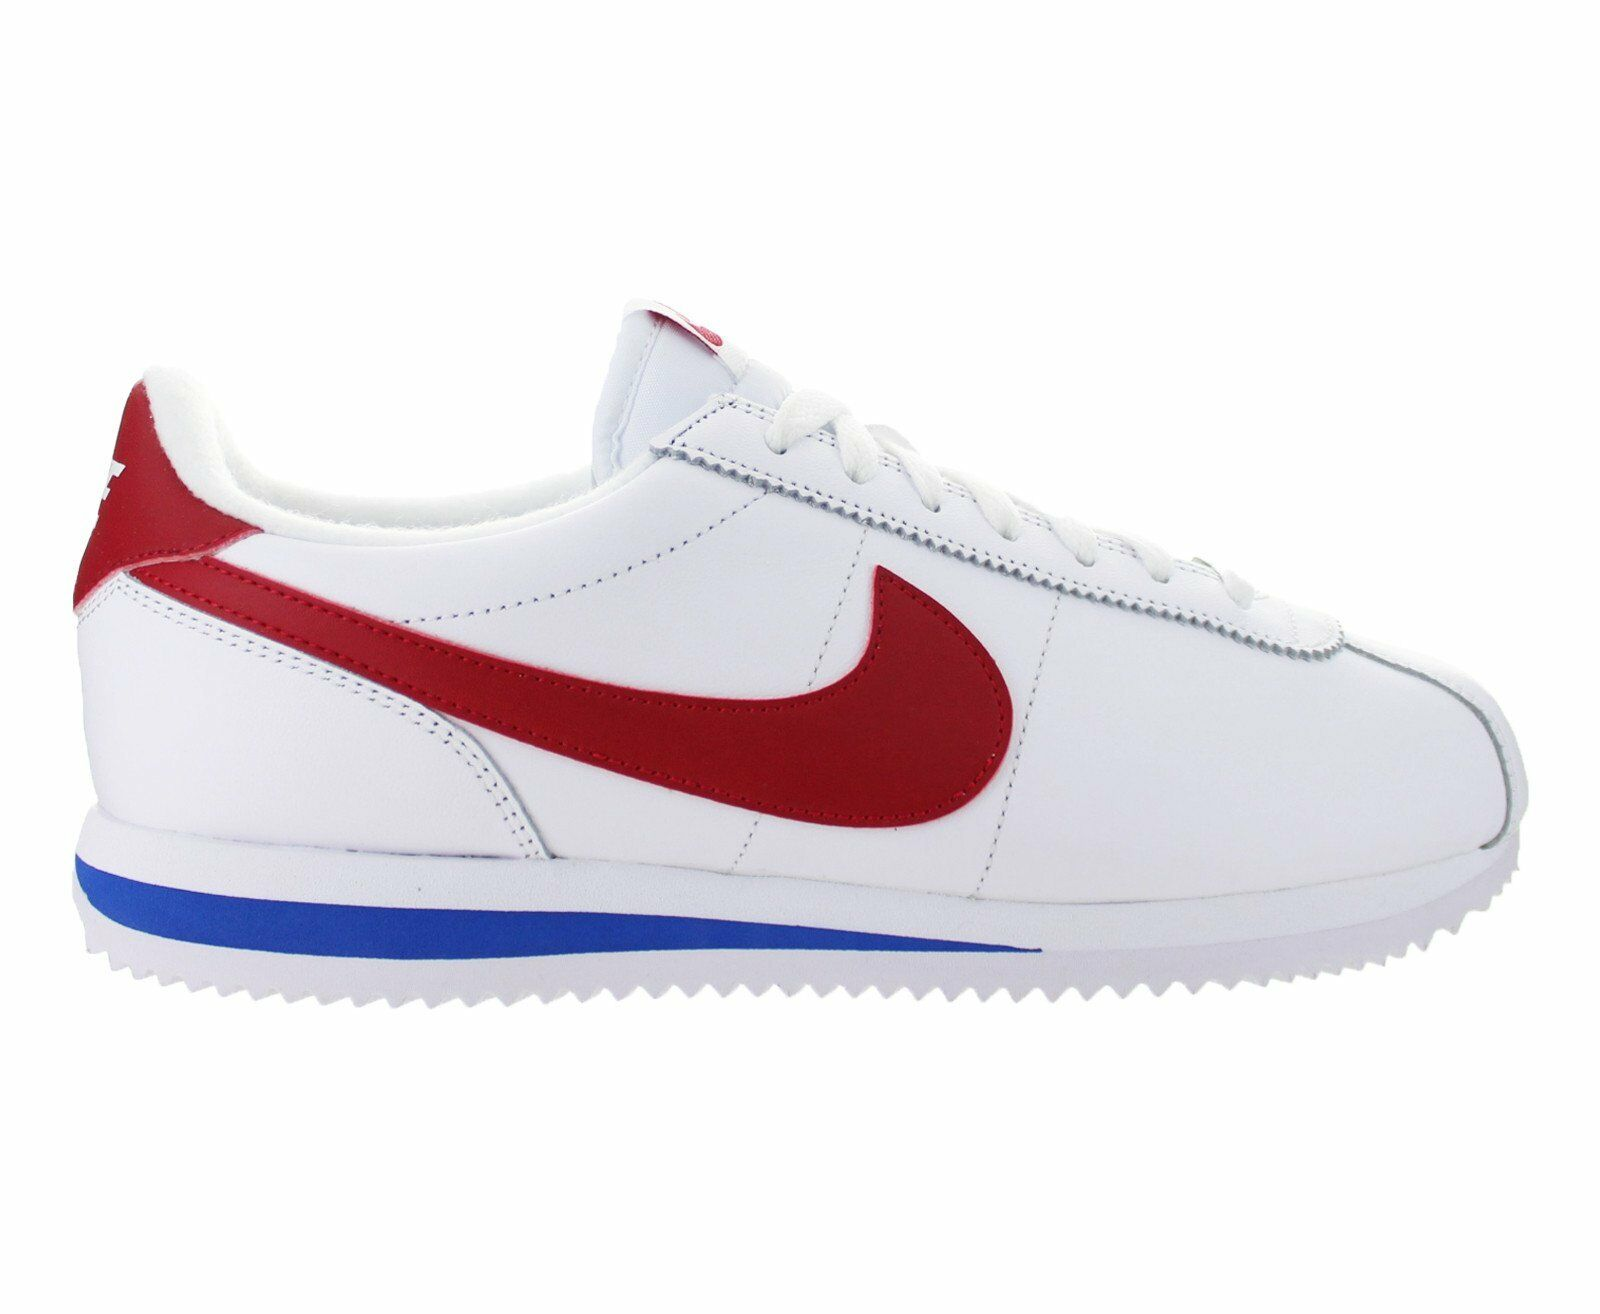 Para Hombre og Nike Cortez Basic Leather og Hombre elusiva Blanco Rojo Universitario Royal 882254164 8286a9